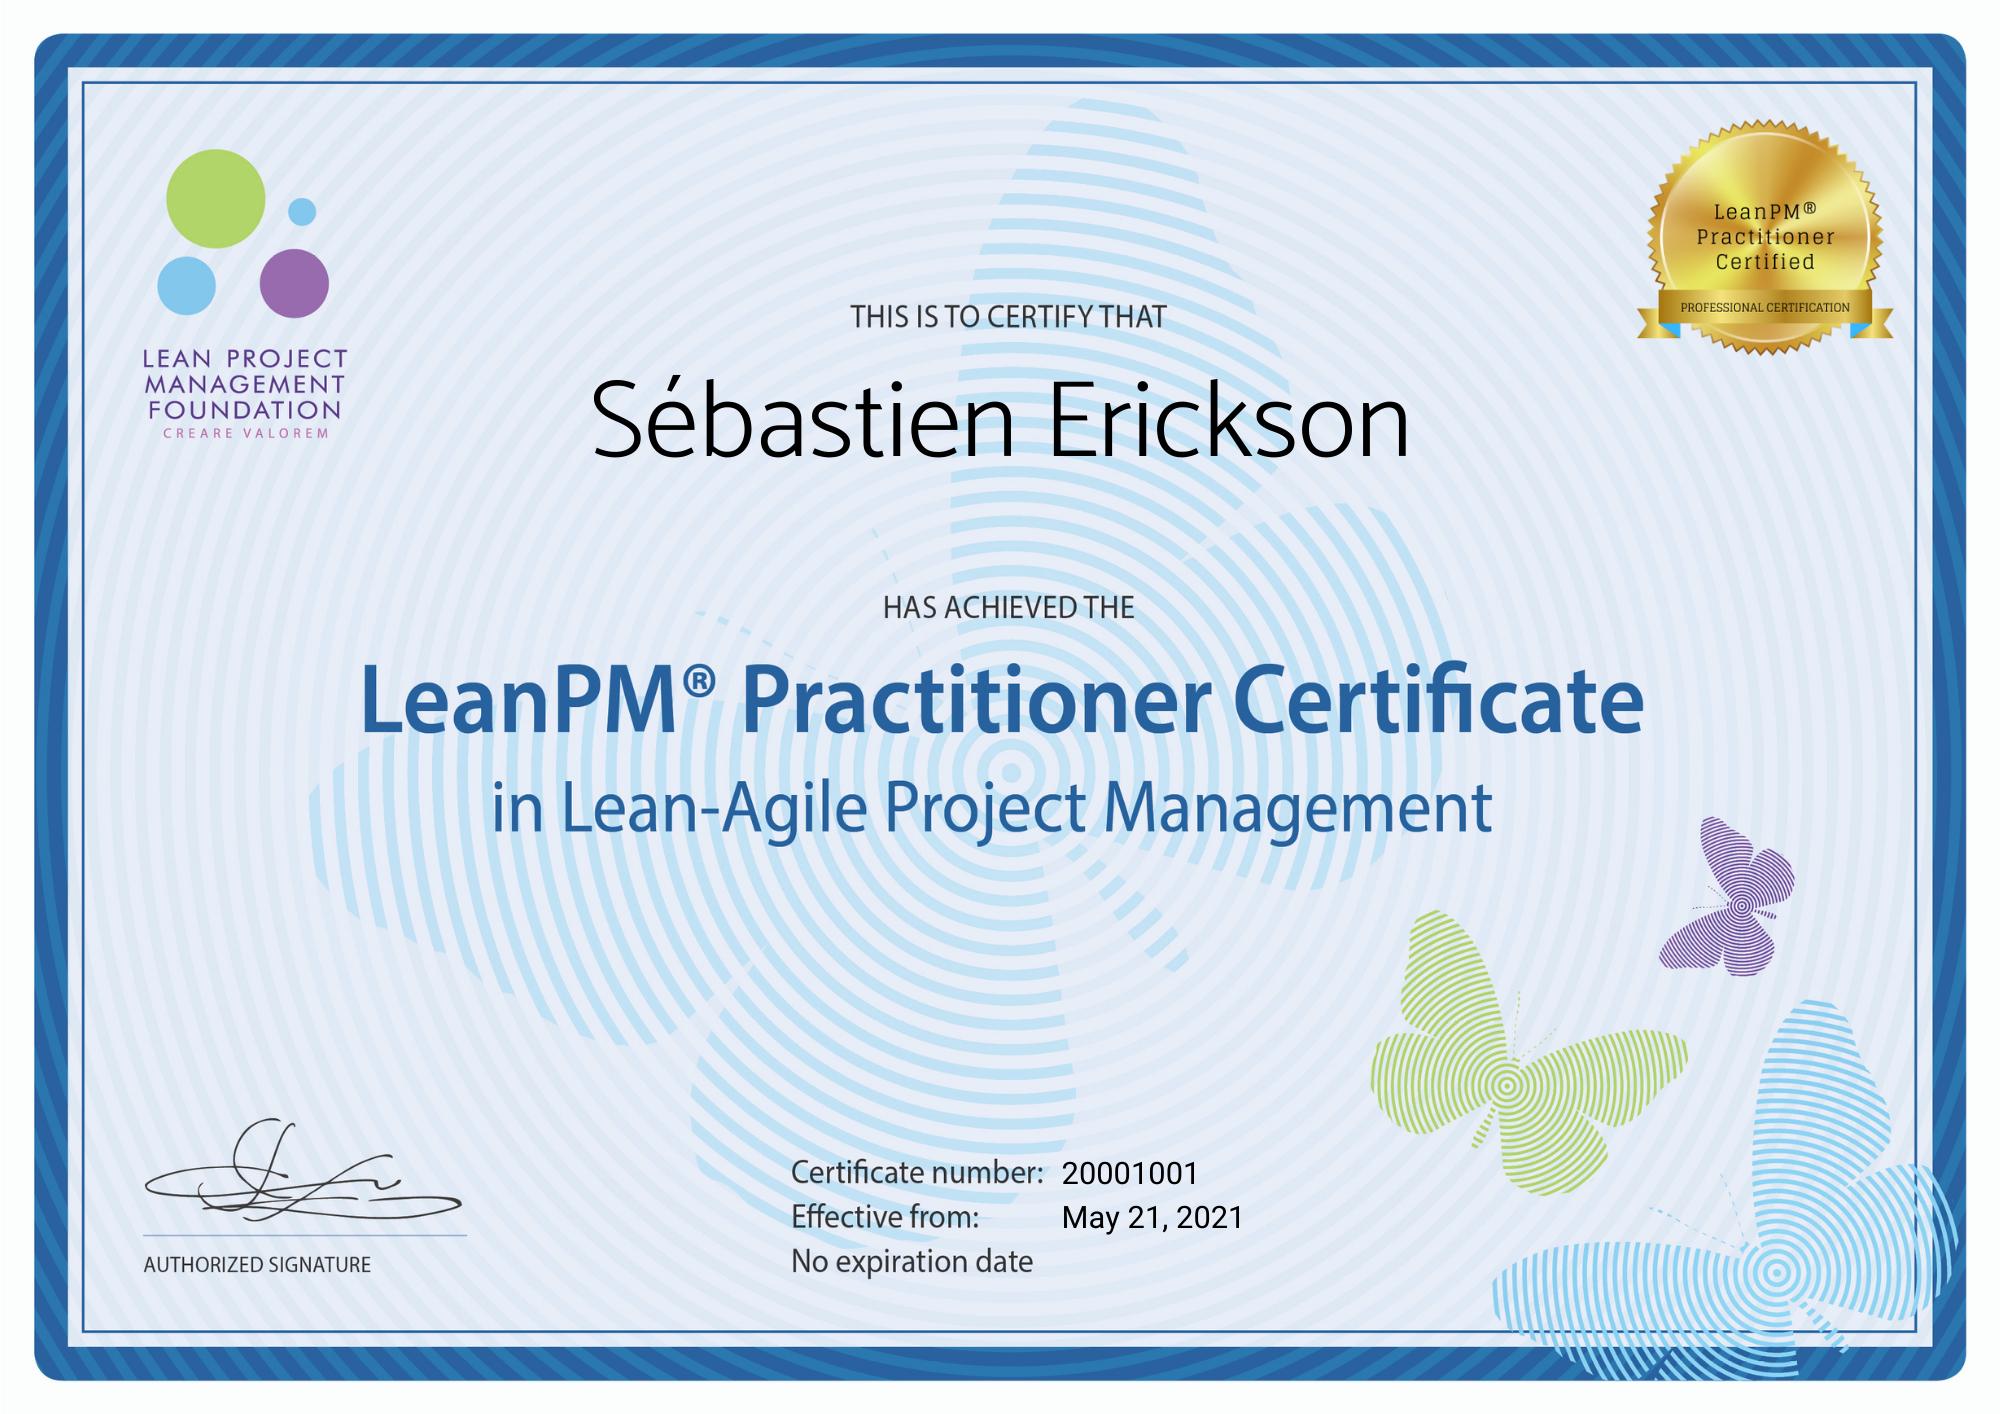 LeanPM Practitioner Certificate